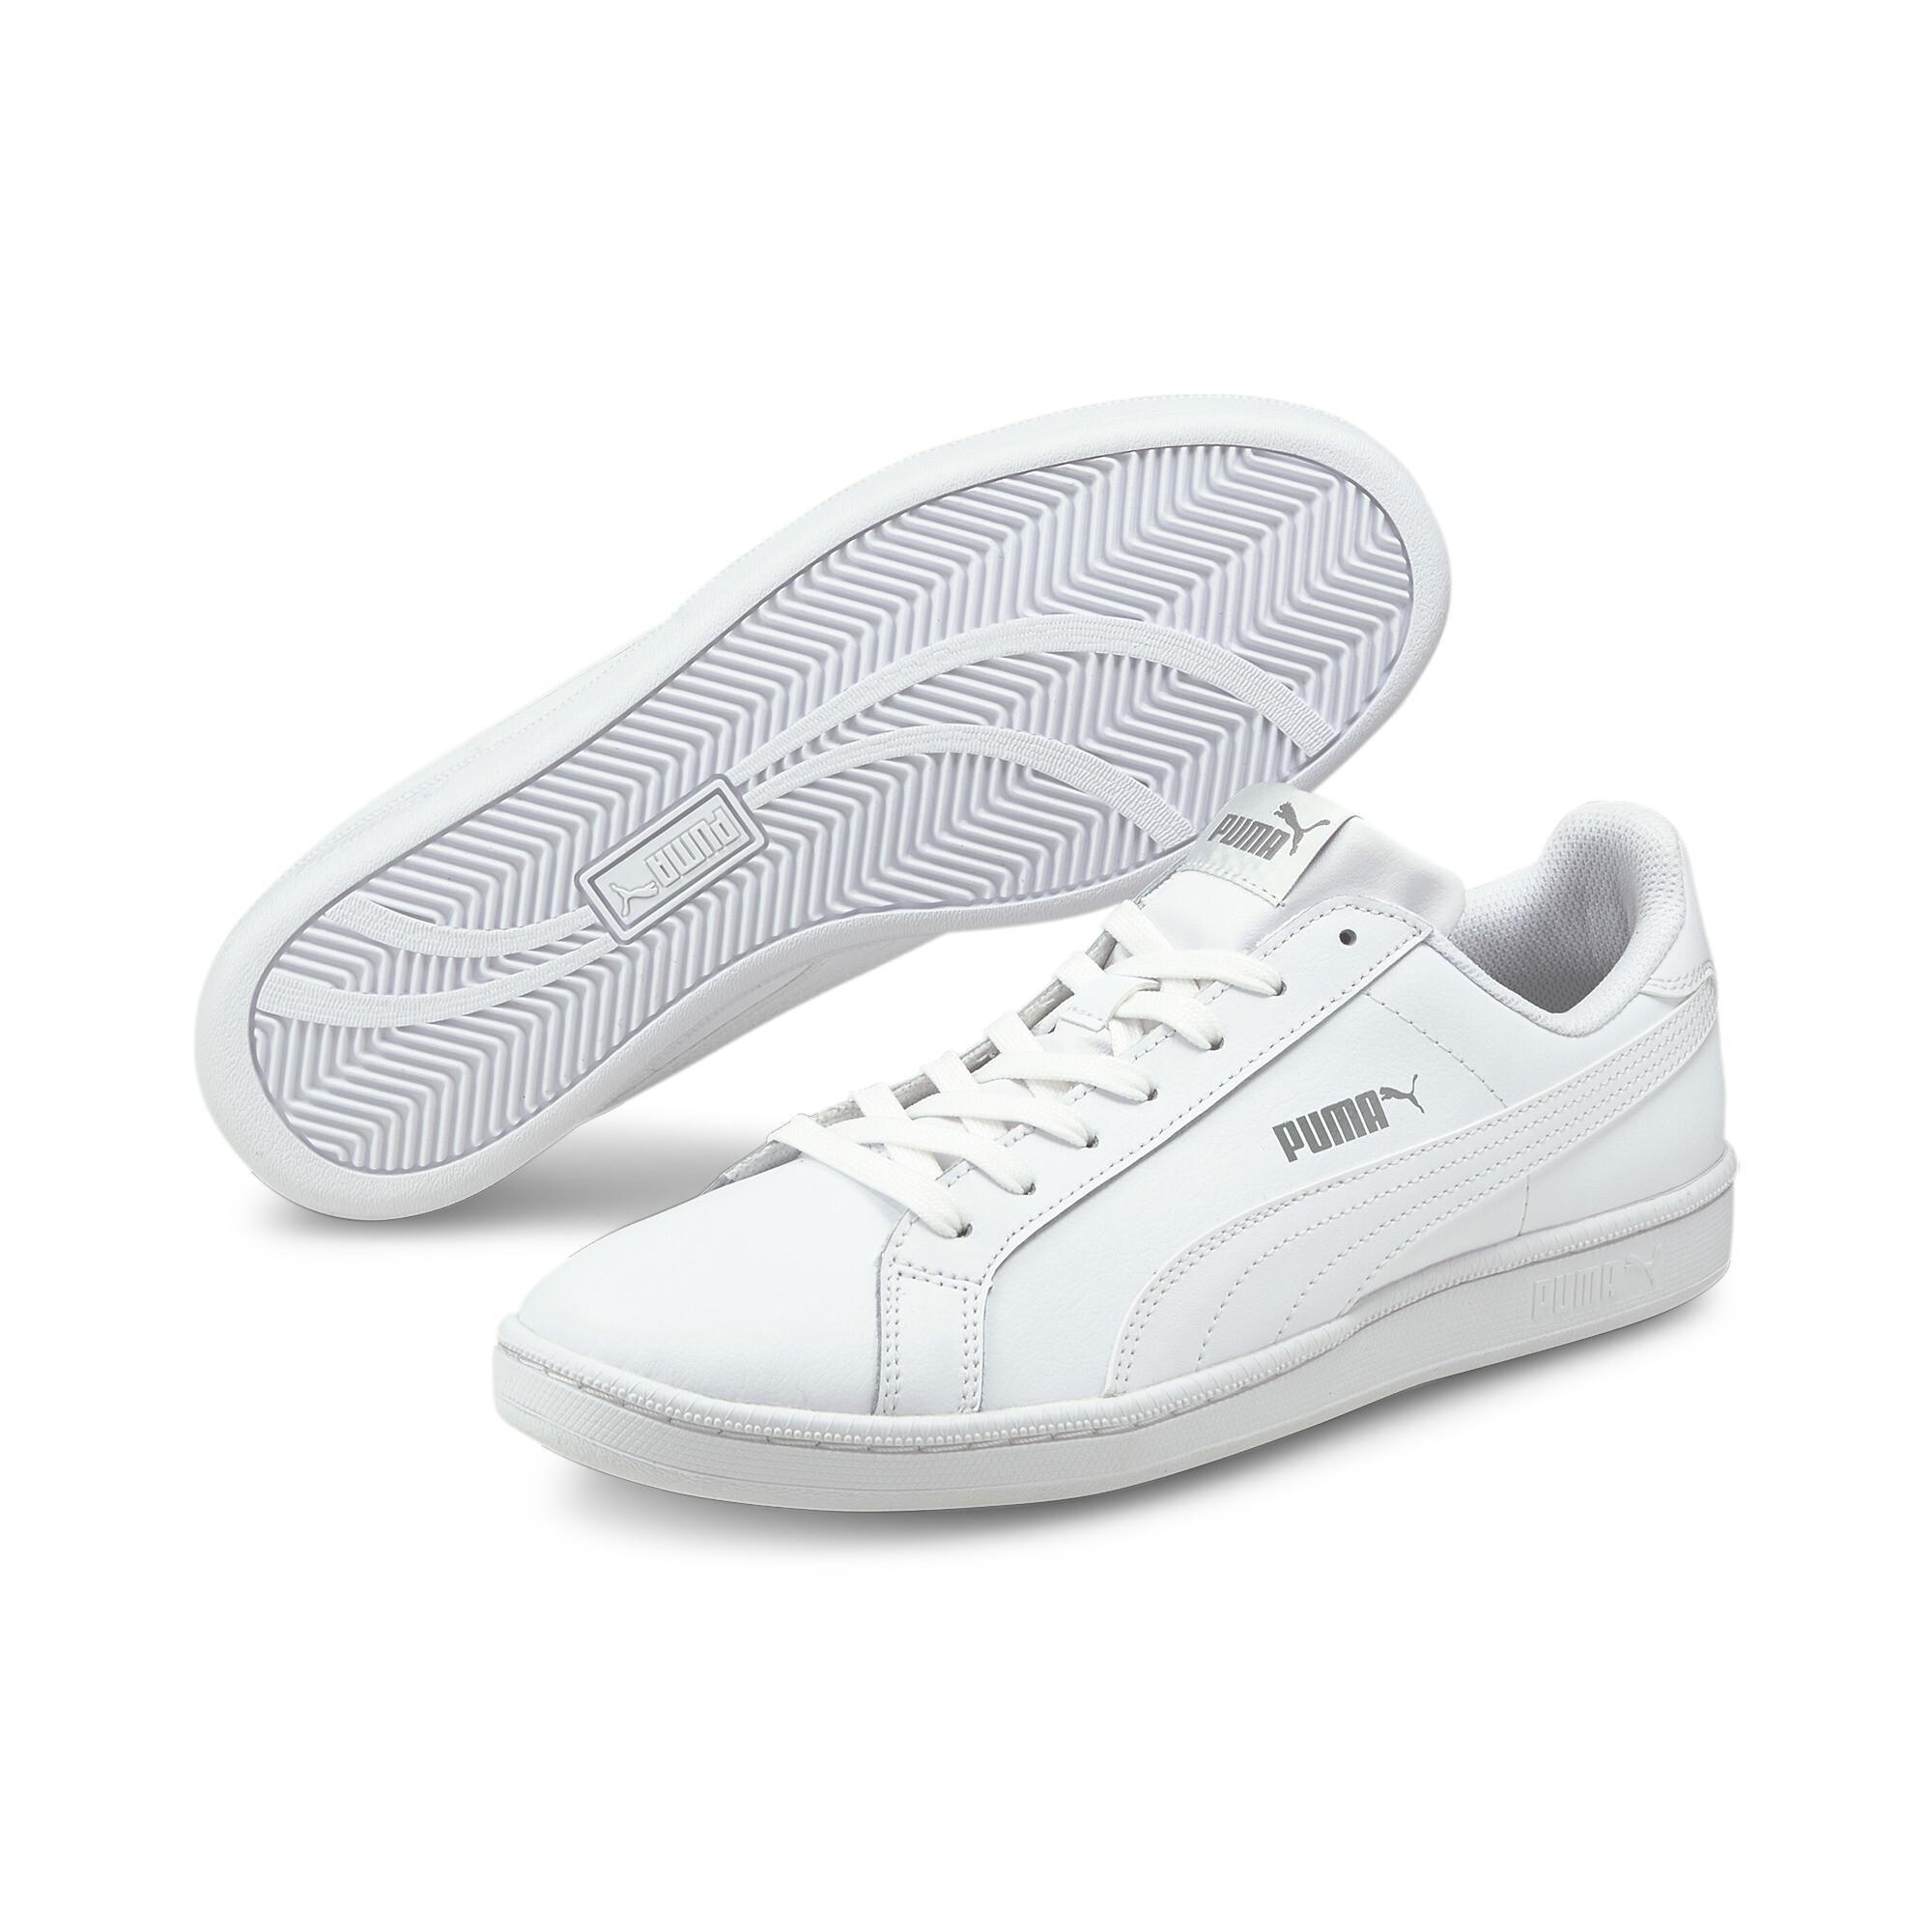 Indexbild 17 - PUMA Smash Trainers Schuhe Sneakers Sport Classics Unisex Neu